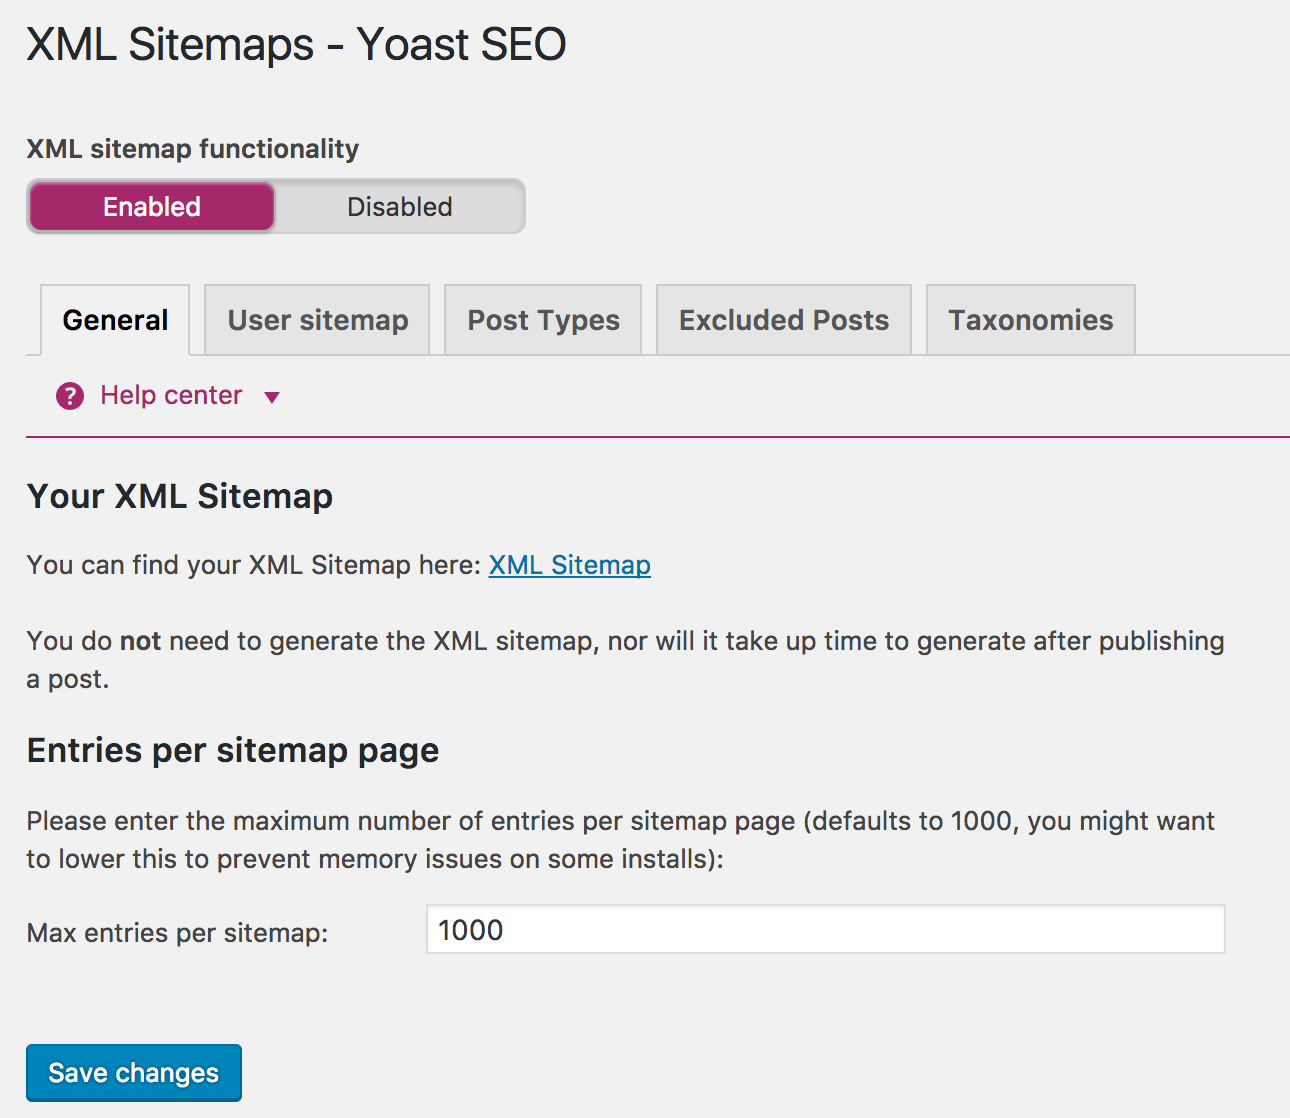 wordpress seo mistakes xml sitemap havoc digital